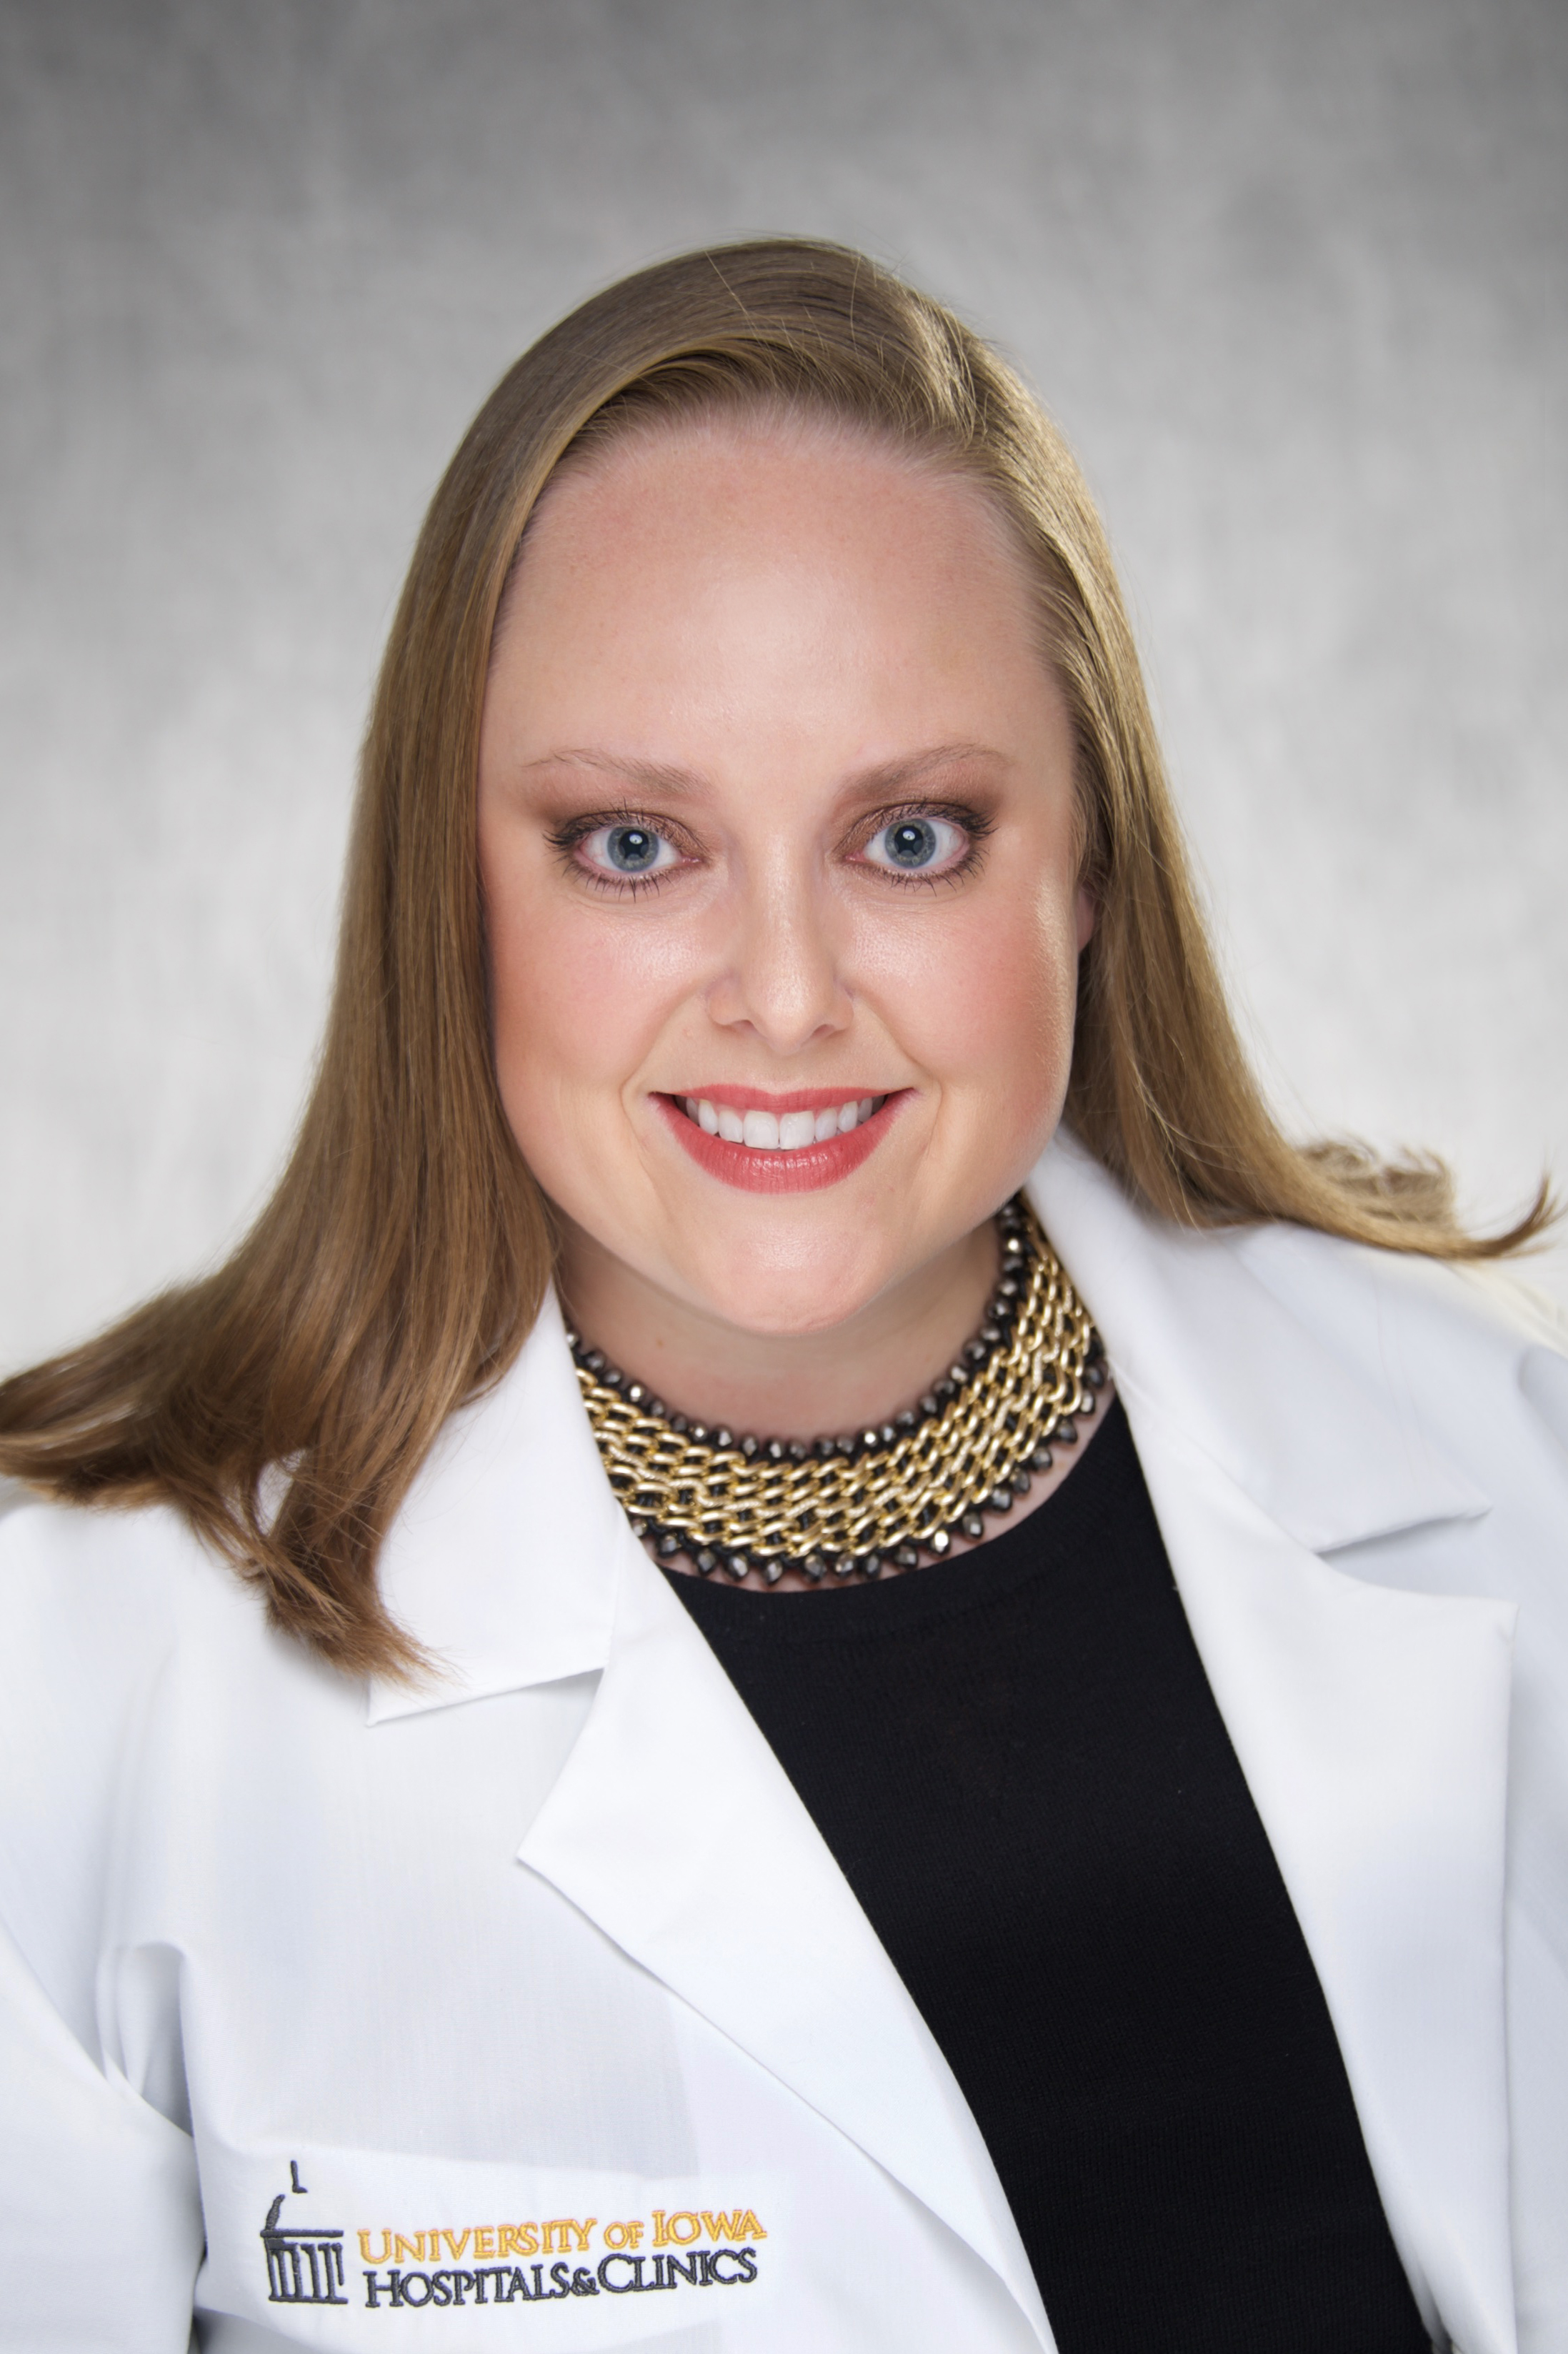 Sharon Beth Larson, DO, MS